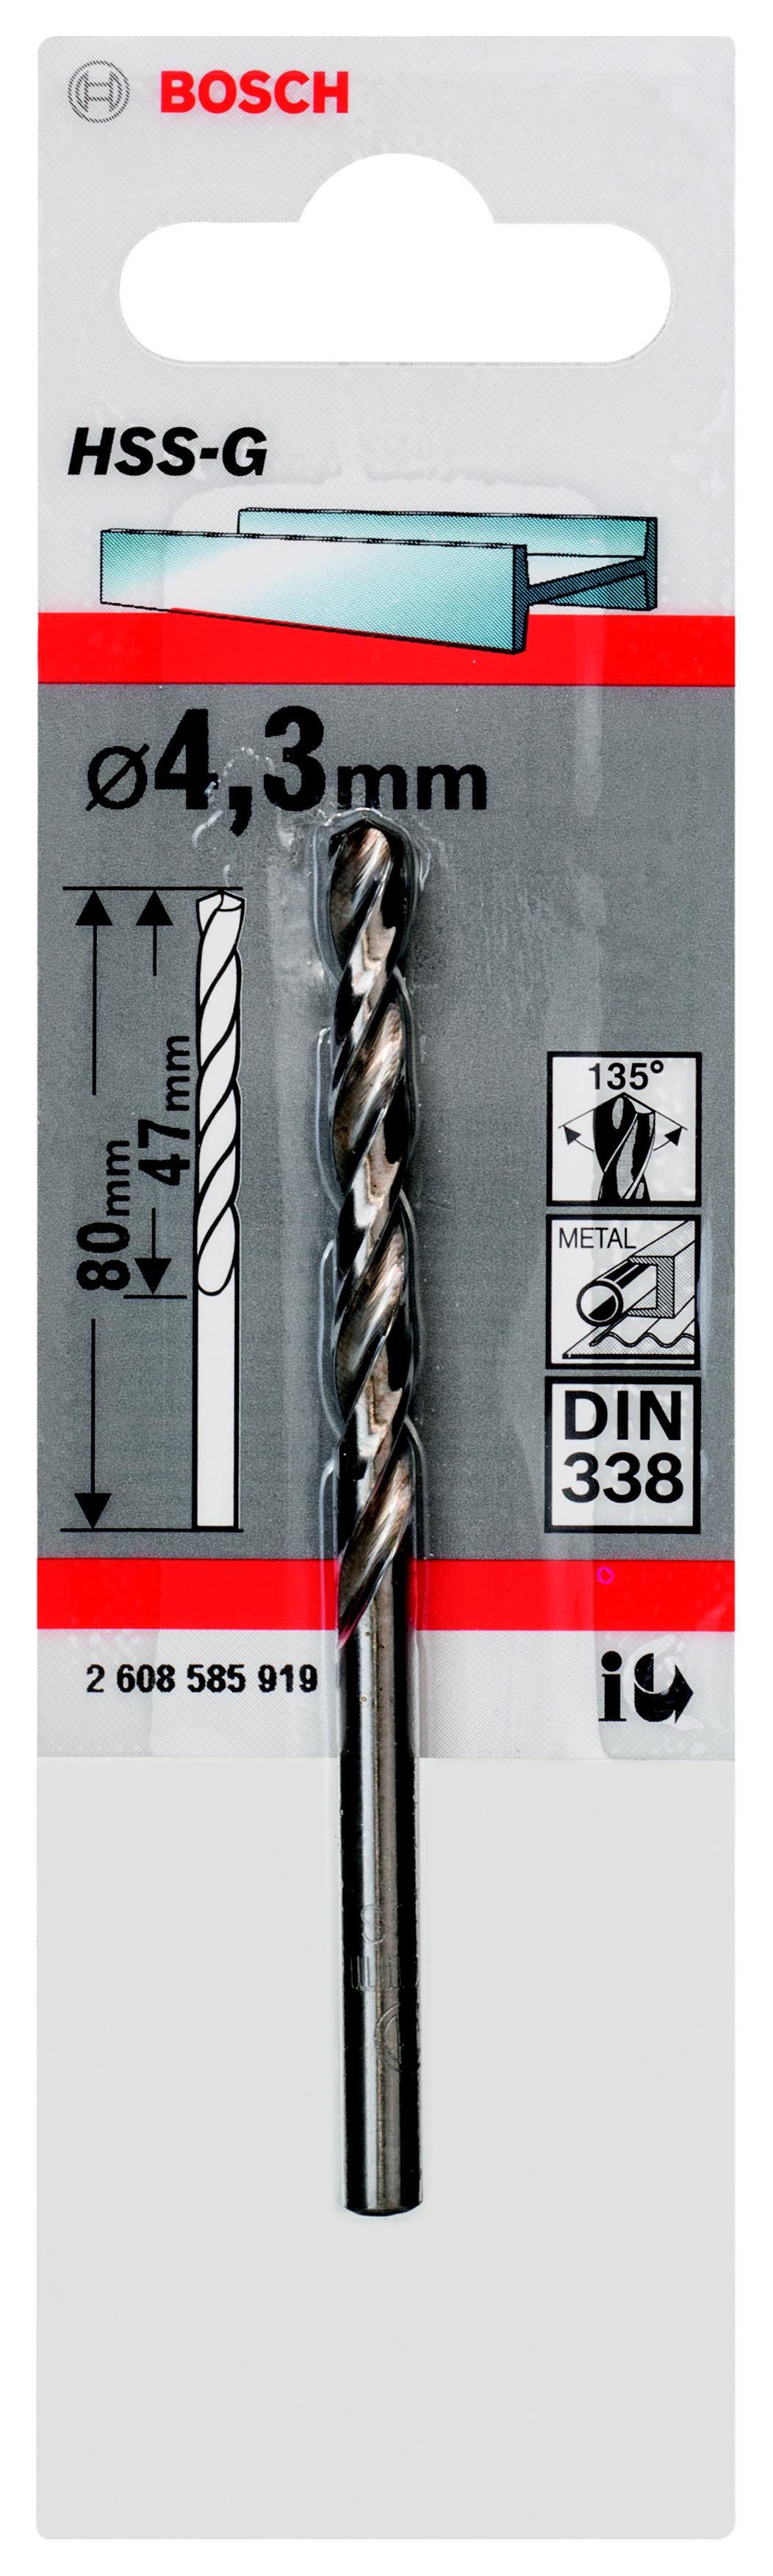 Сверло Bosch 1 hss-g (2.608.585.919) тиски механические bosch ms 80 g